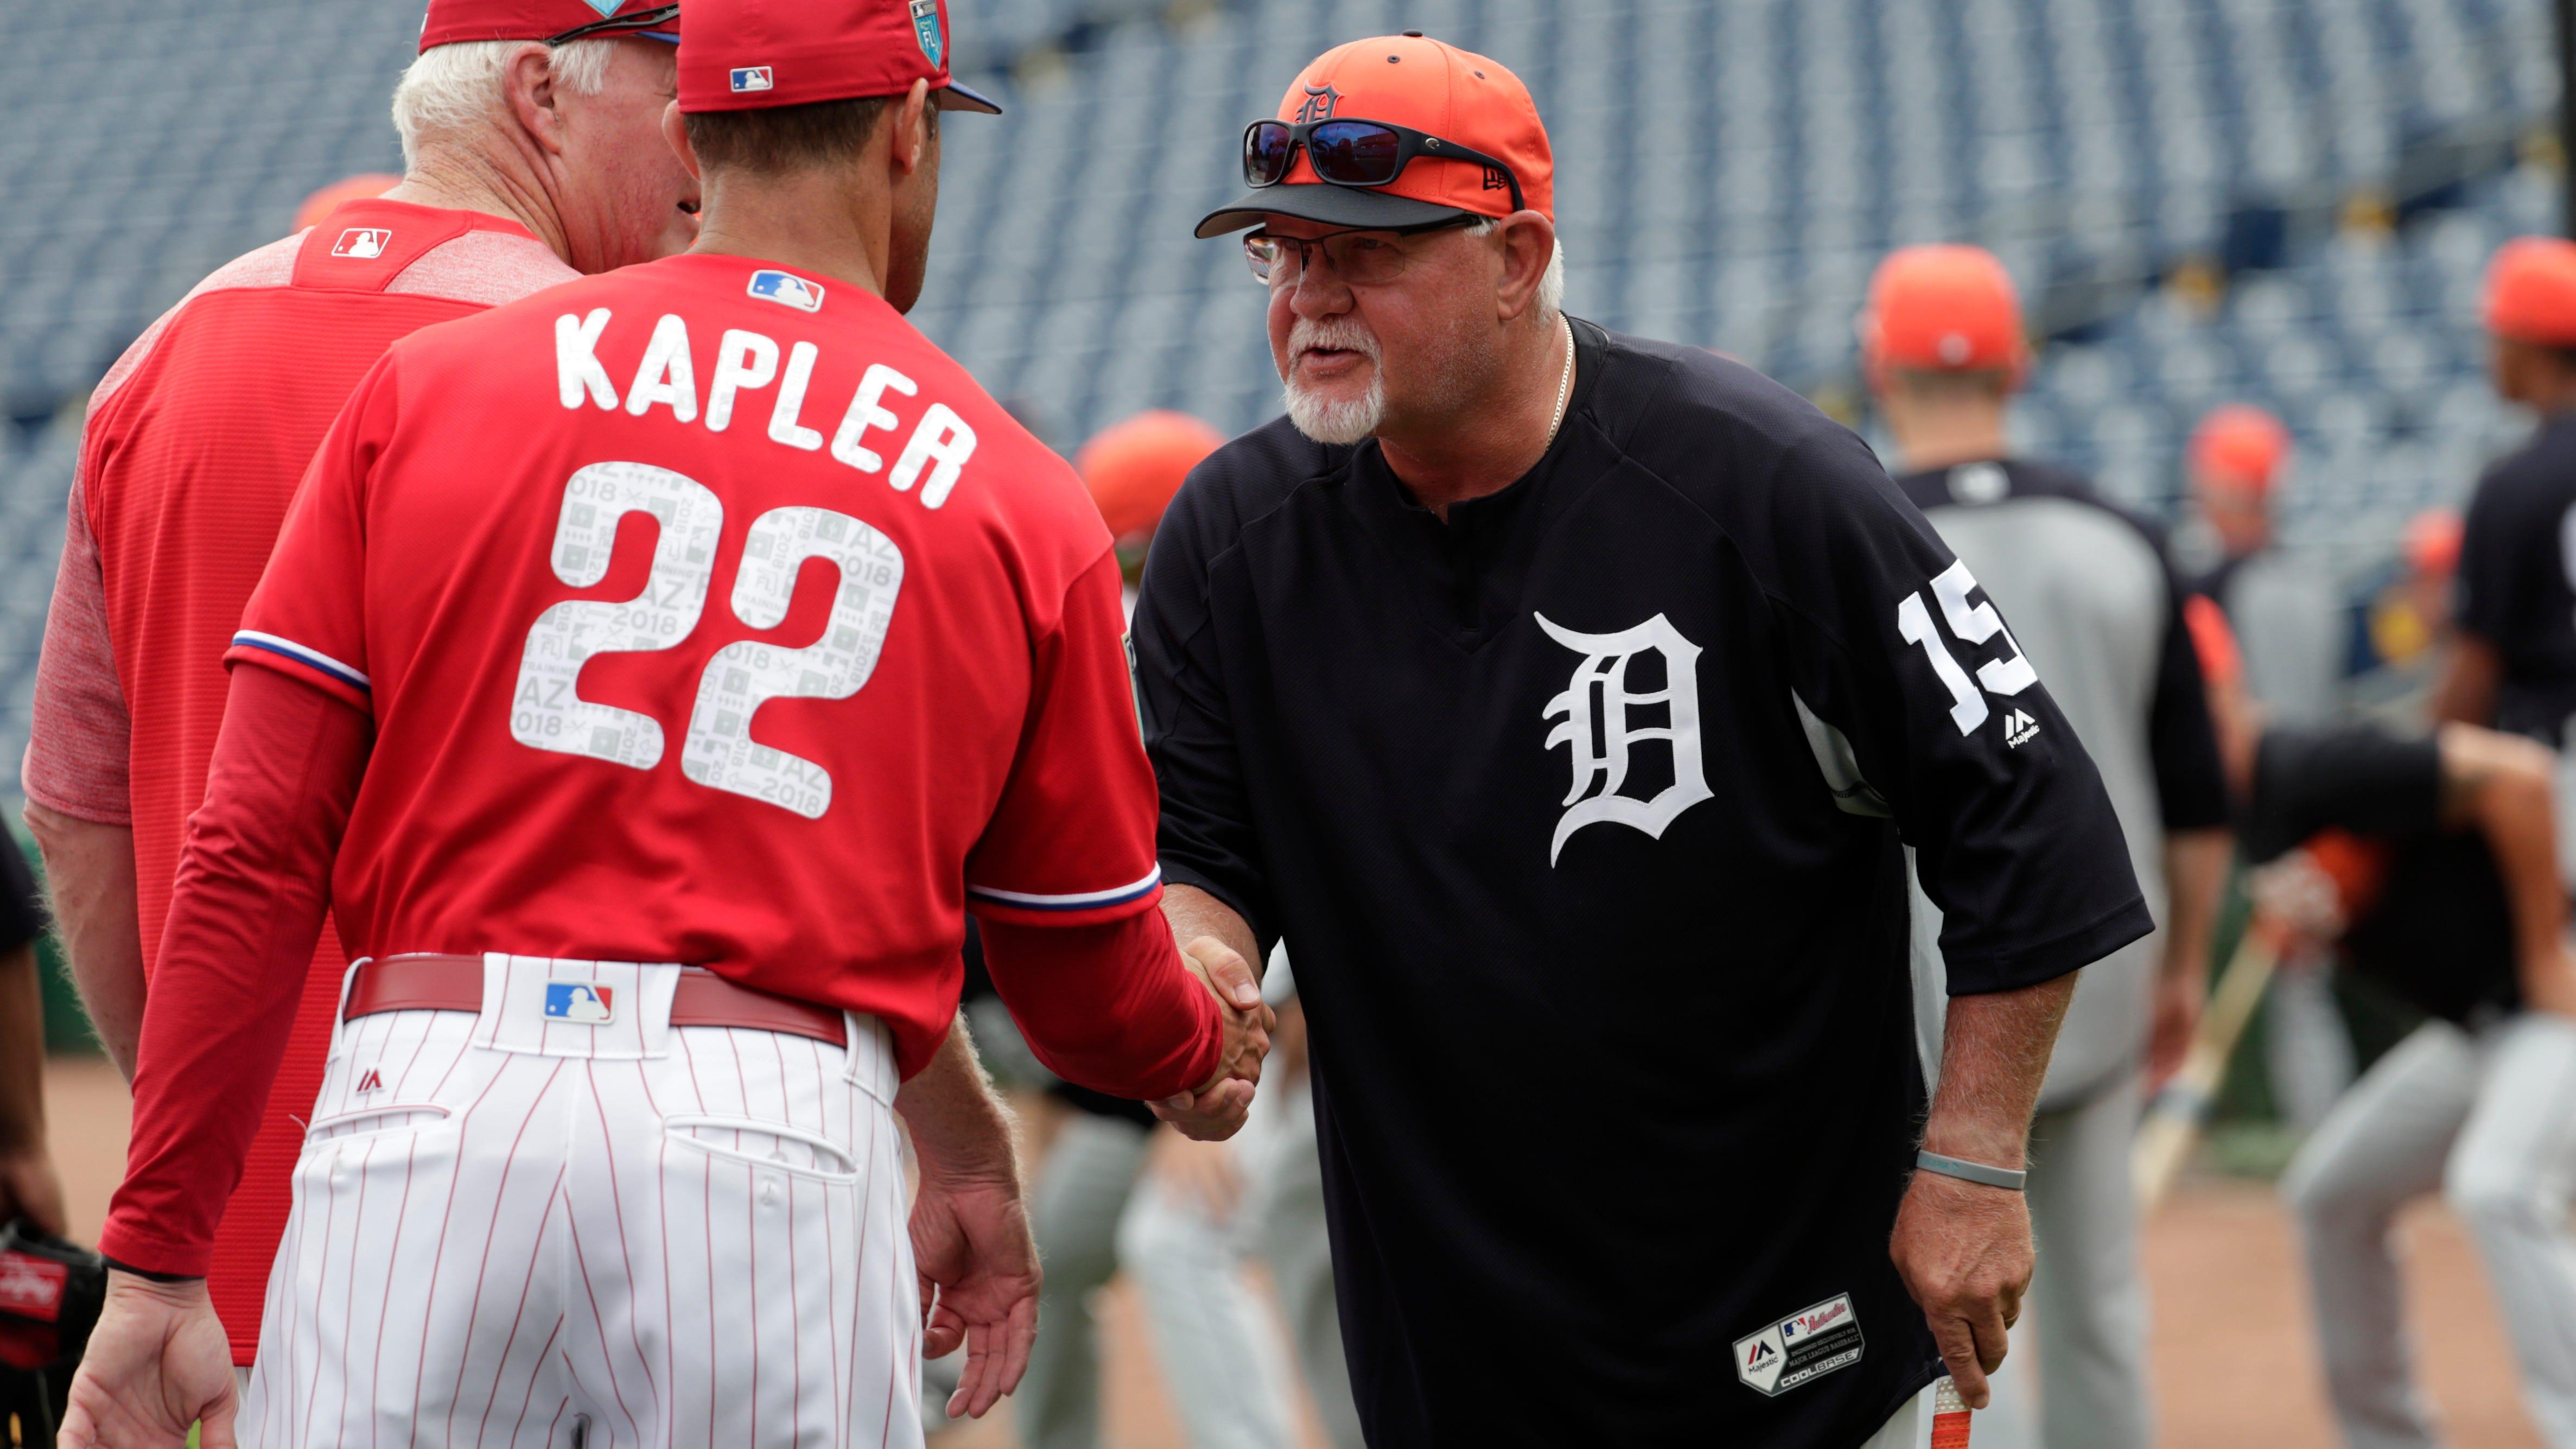 Collection Here Gabe Kapler Detroit Tigers Auto American League Baseball Autographs-original